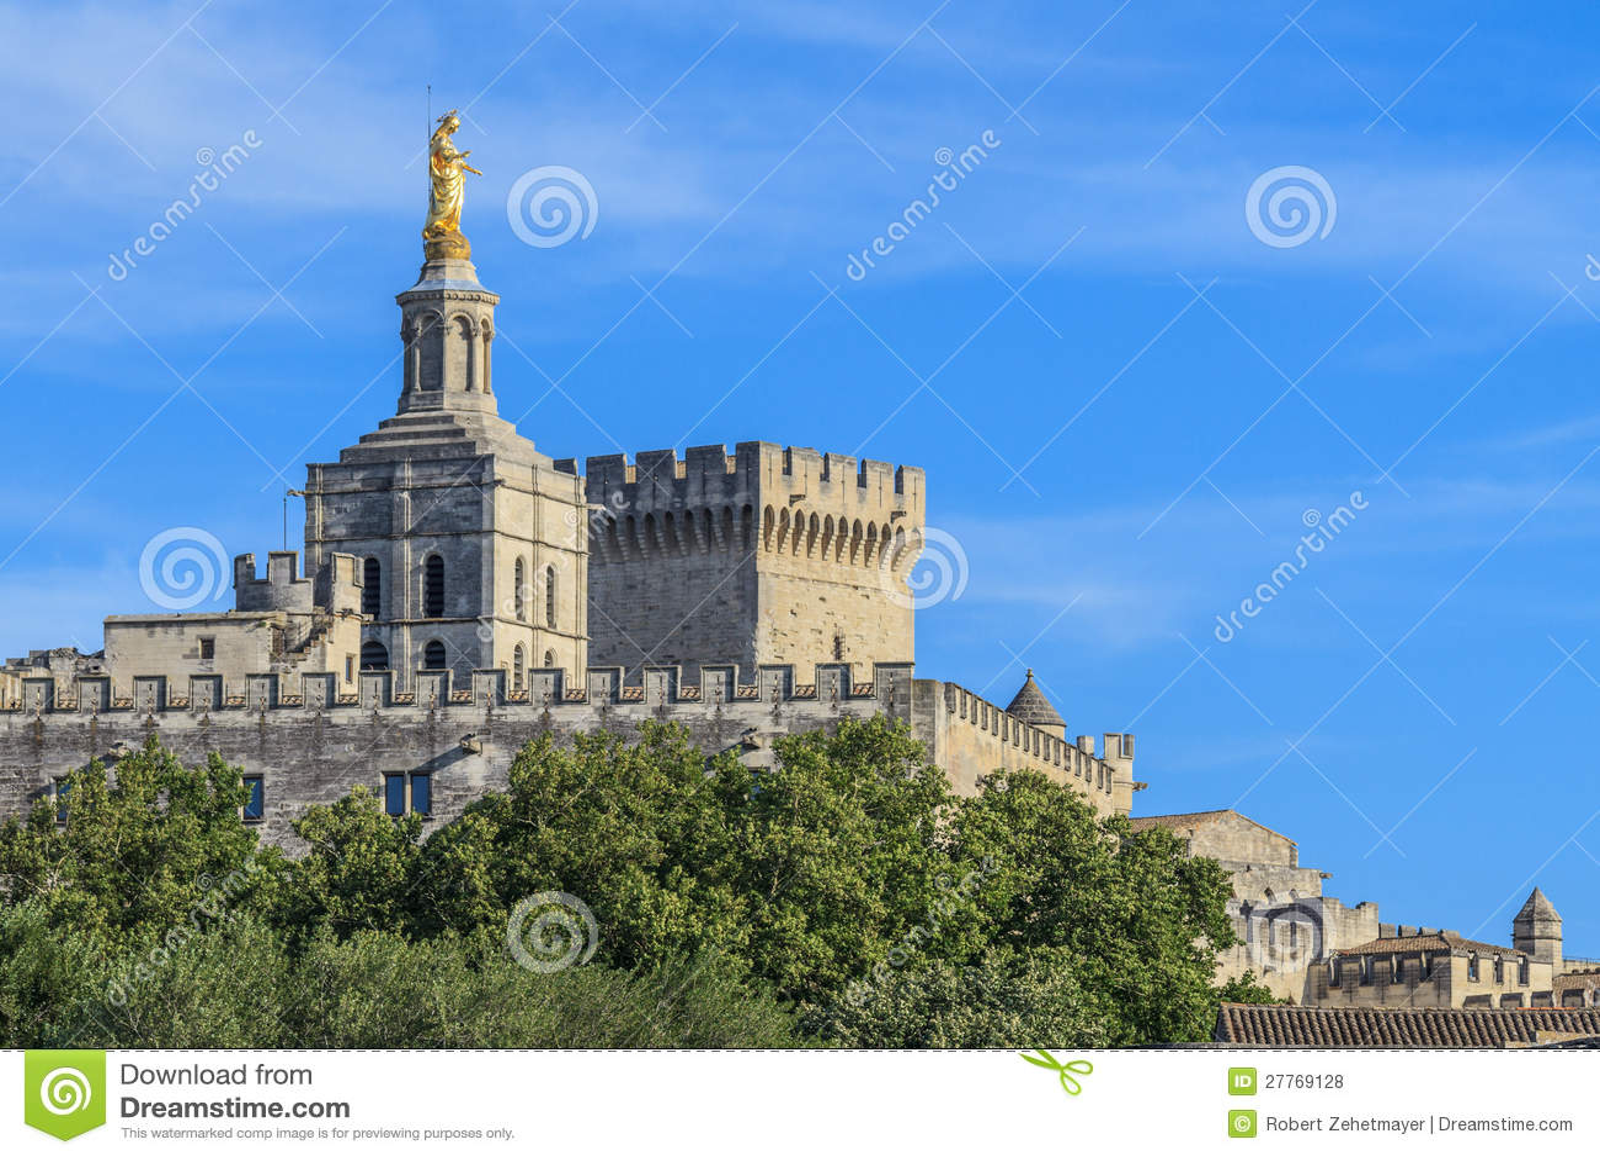 avignon p pste palace frankreich lizenzfreie stockfotos bild 27769128. Black Bedroom Furniture Sets. Home Design Ideas